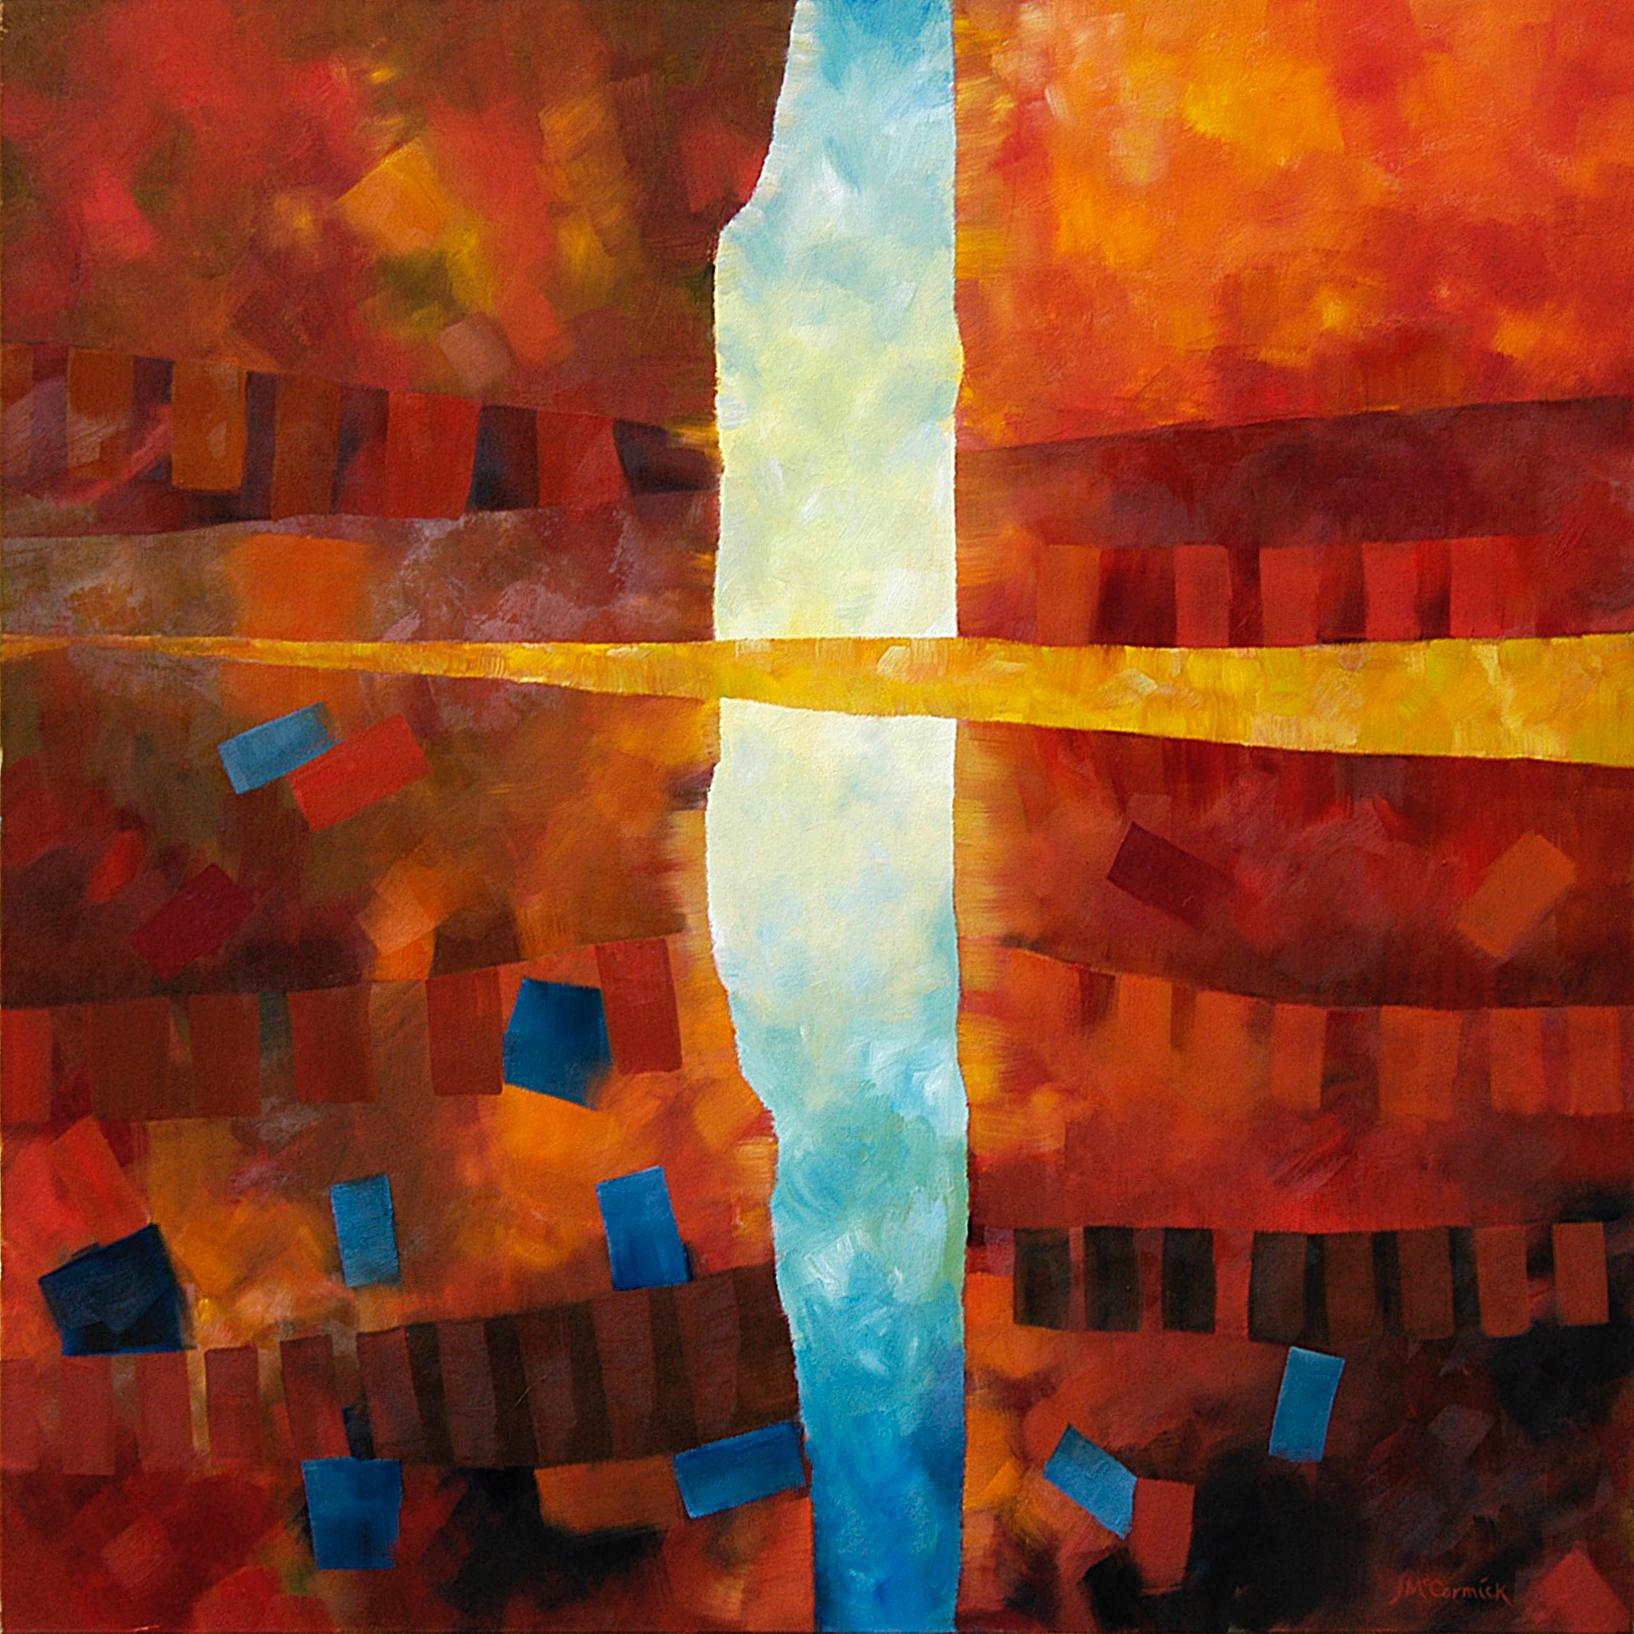 Reflection II - Johanna McCormick